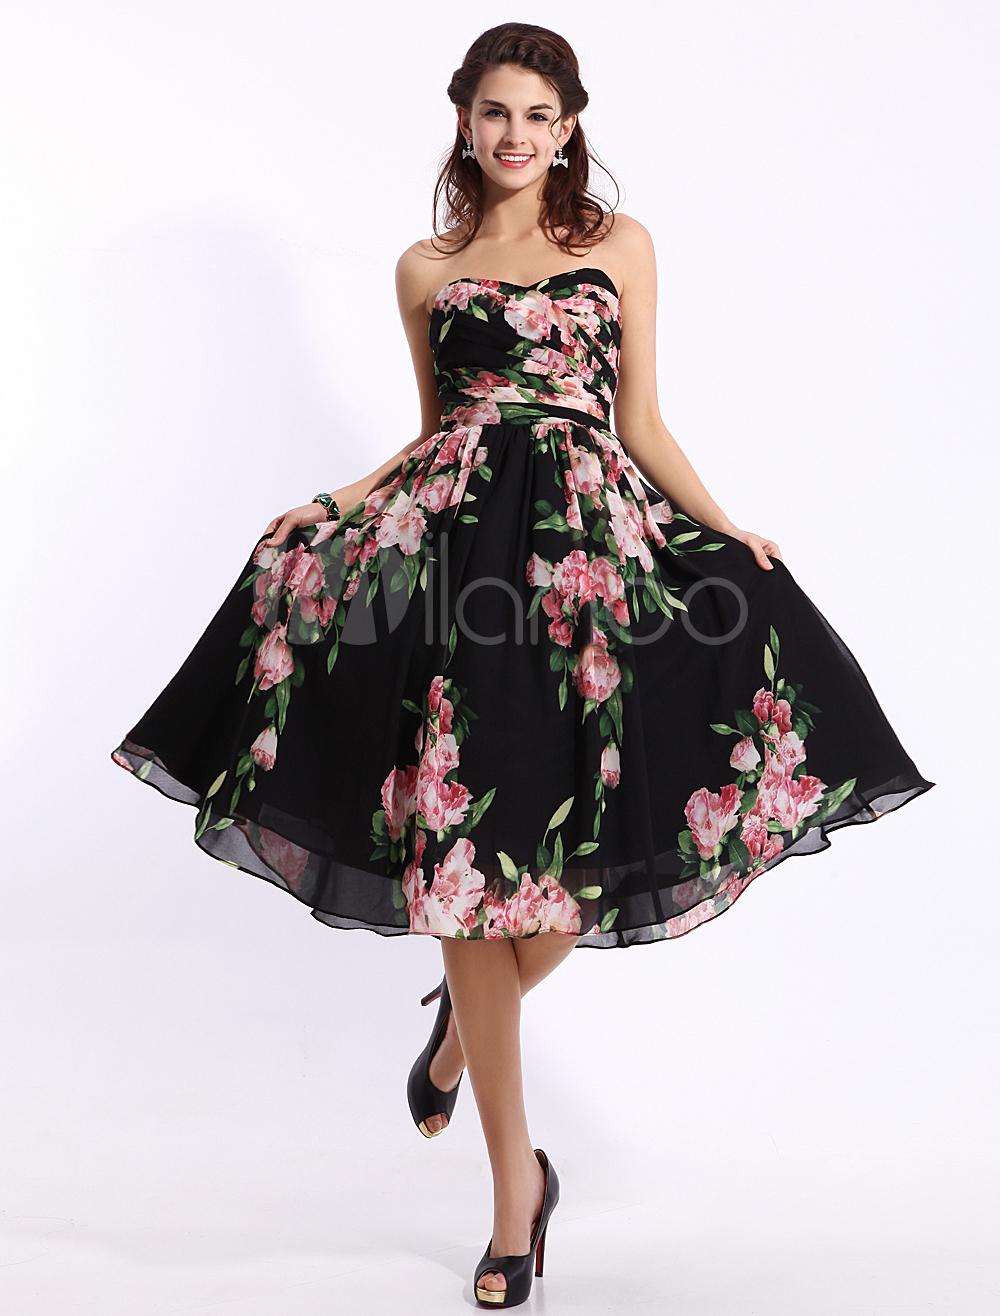 Black Prom Dresses 2018 Short Strapless Floral Print Cocktail Dress Sweetheart Chiffon Party Dress Wedding Guest Dress Milanoo (Cocktail Dresses) photo